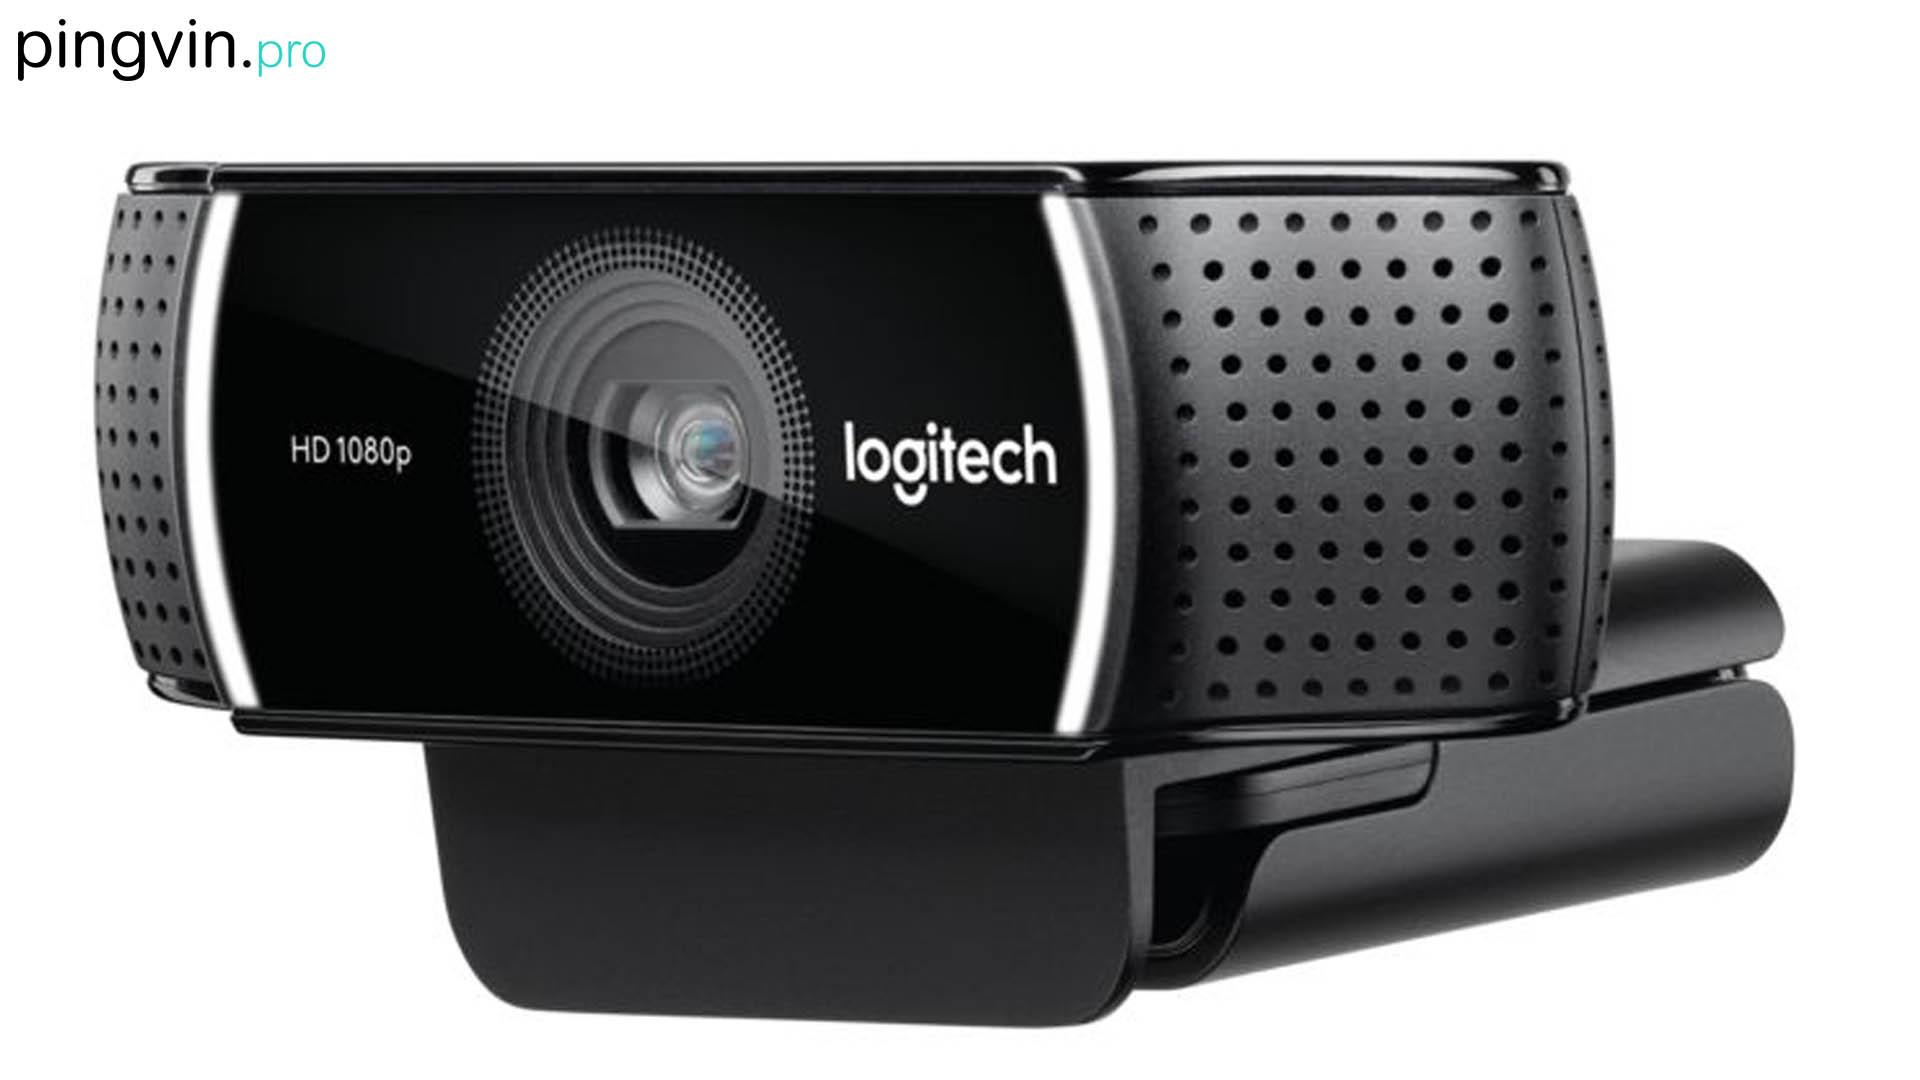 Pc mag webcam articles